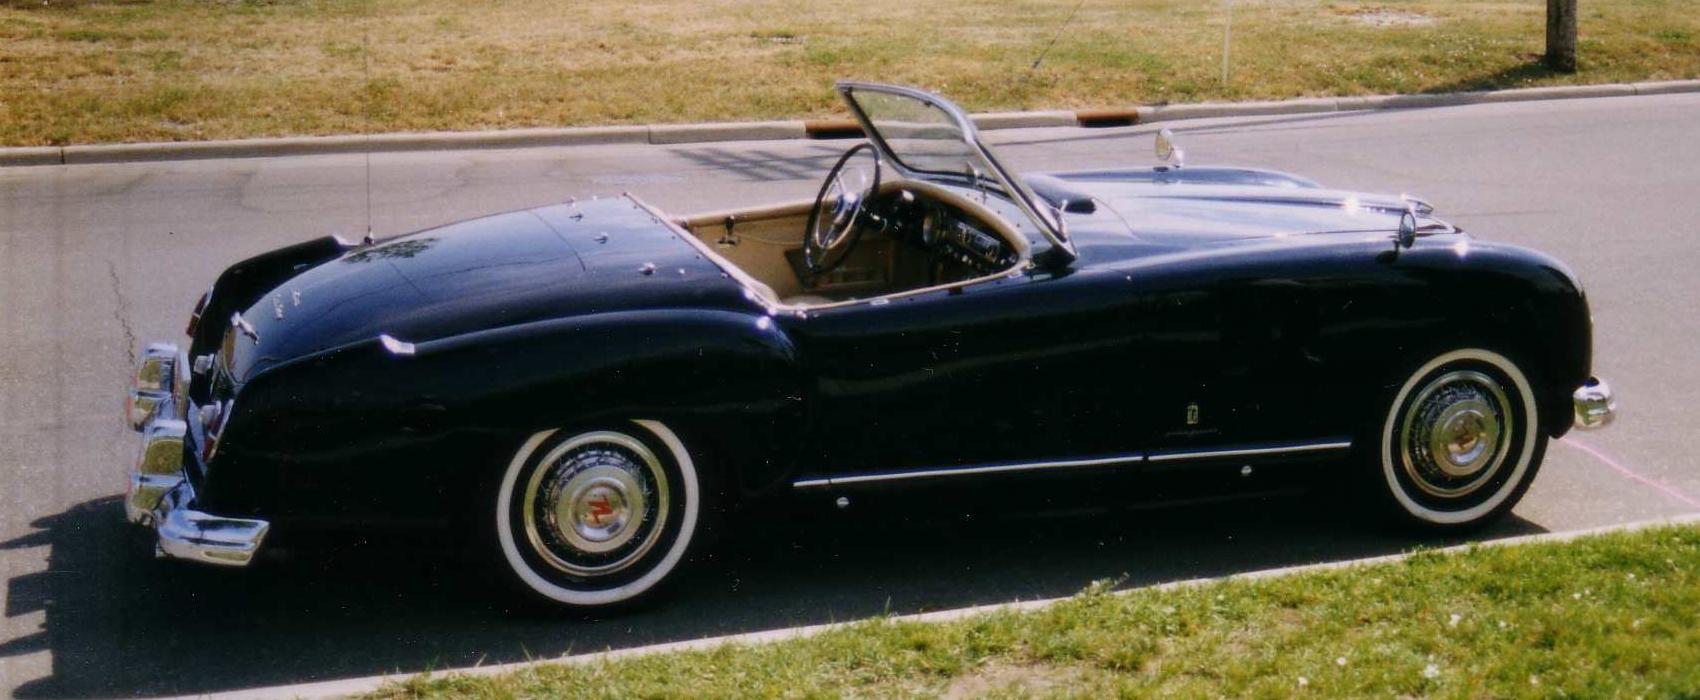 Nash Healey Sports Car For Sale